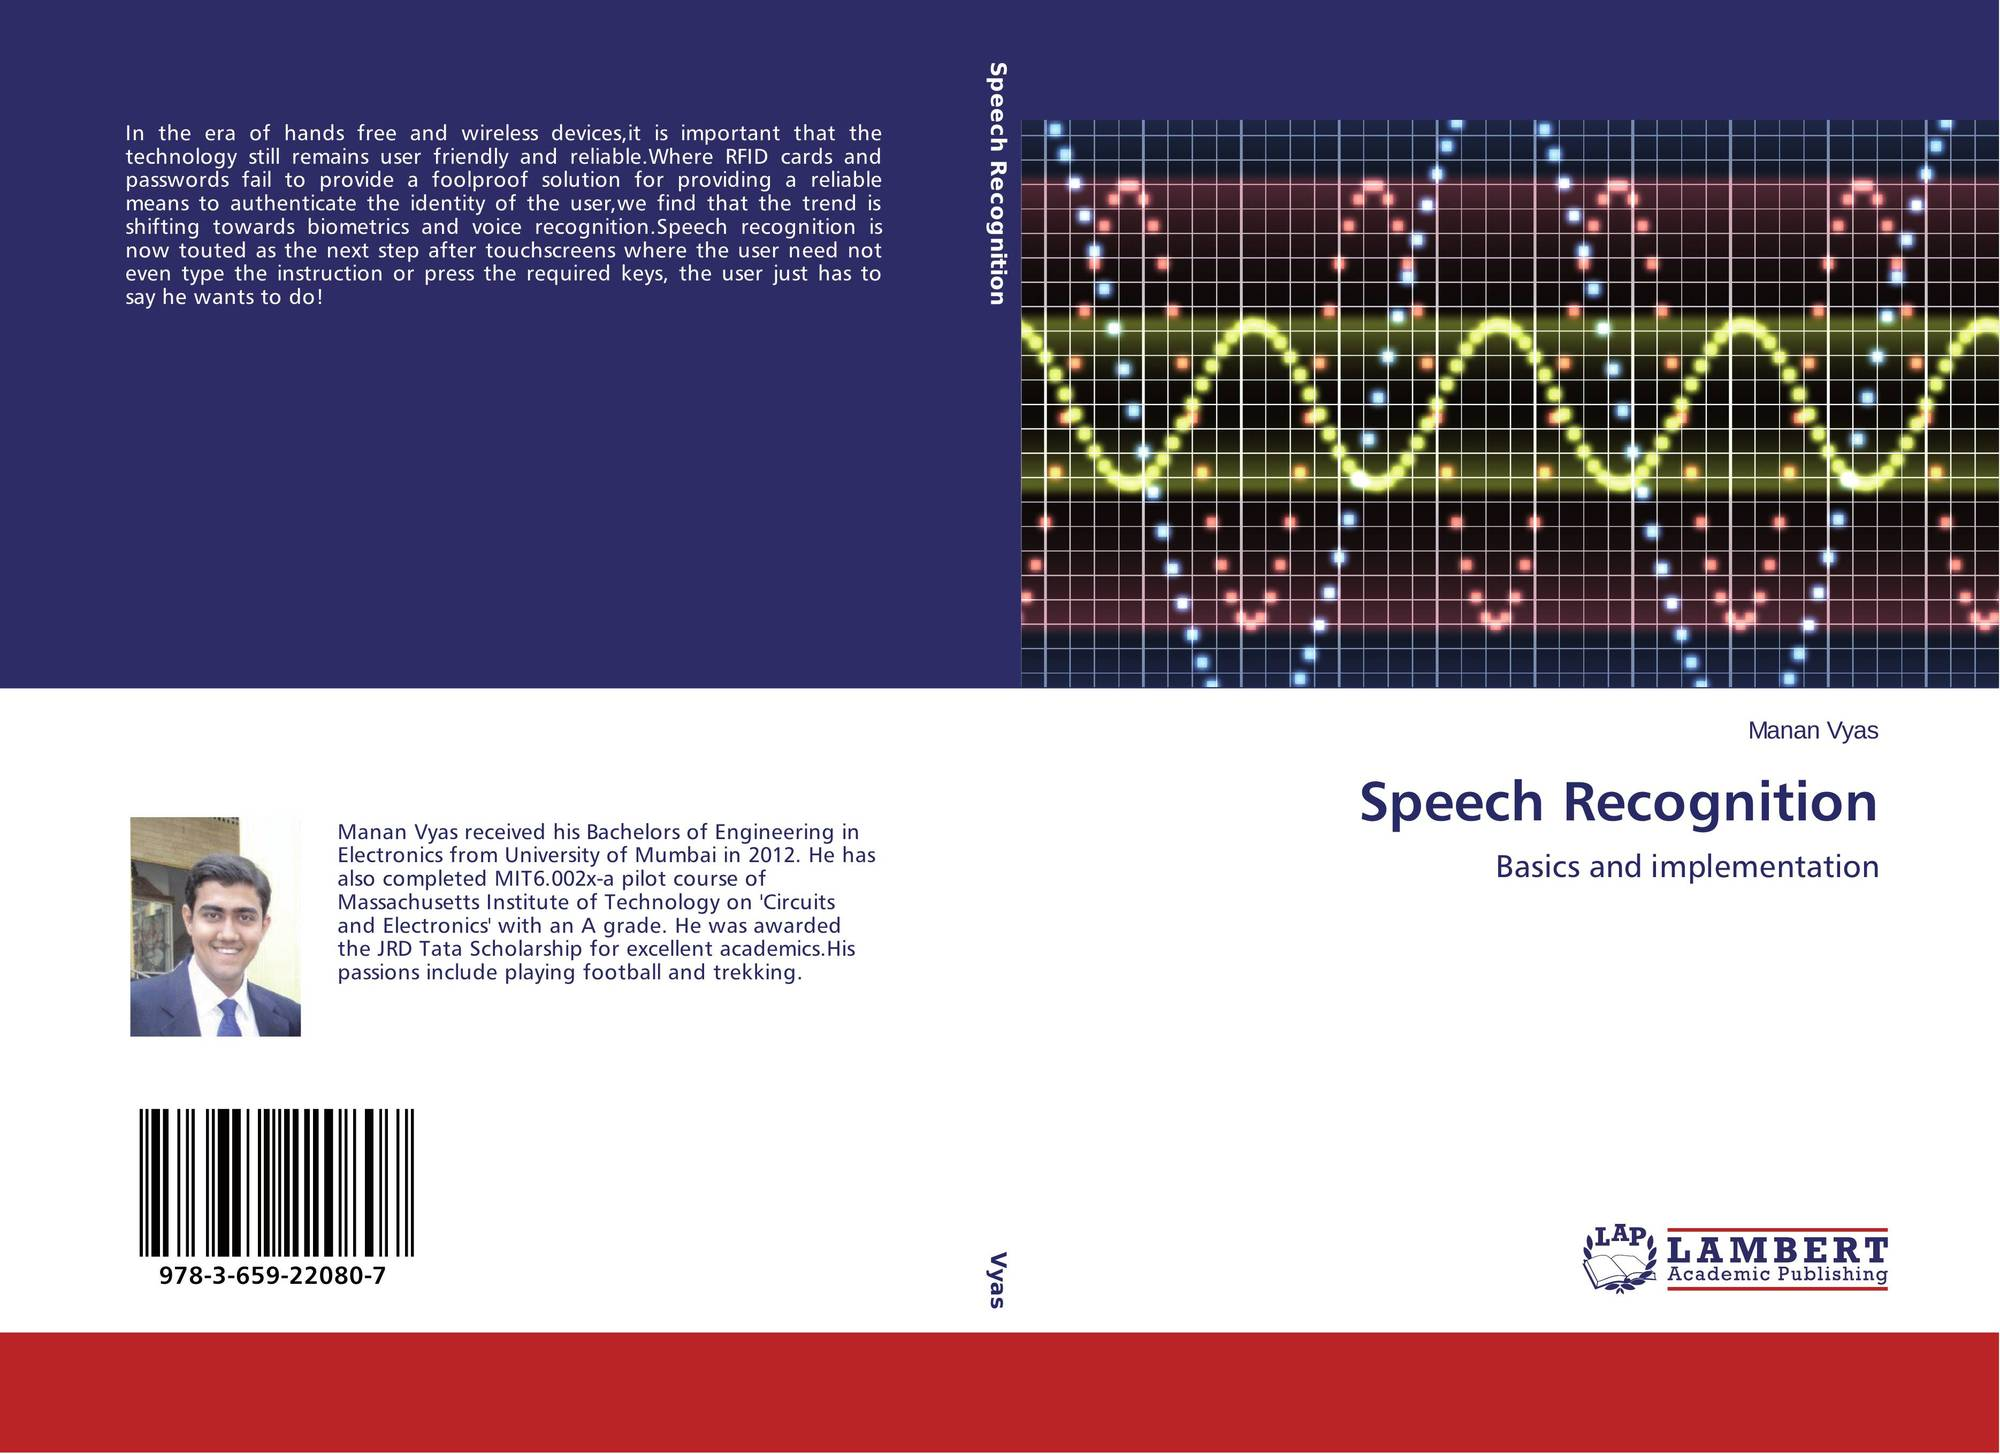 Speech Recognition, 978-3-659-22080-7, 3659220809